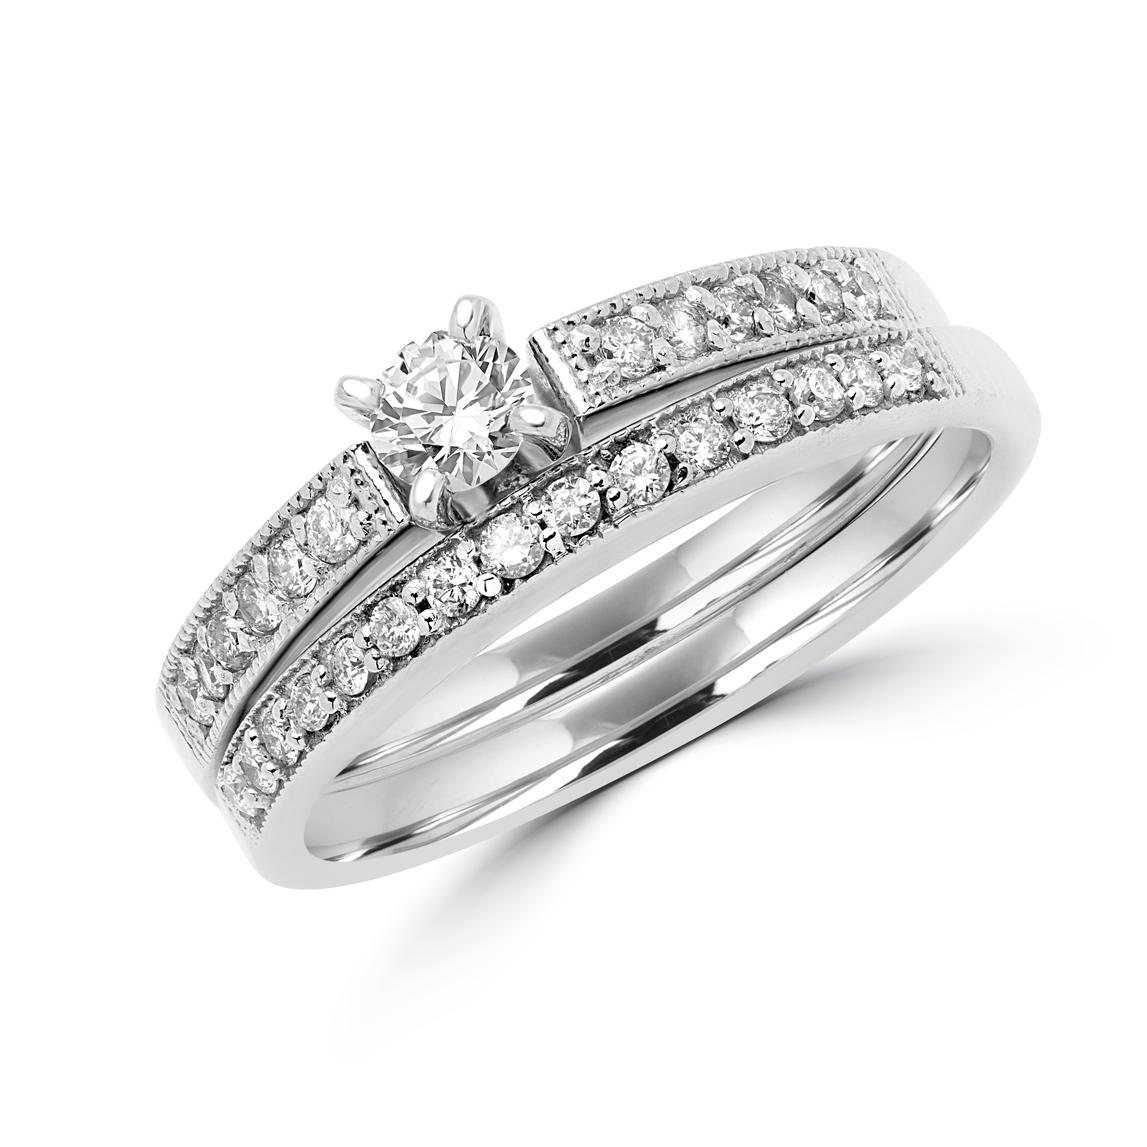 DIAMOND ENGAGEMENT RING AND WEDDING BAND BRIDAL SET IN 14K WHITE GOLD